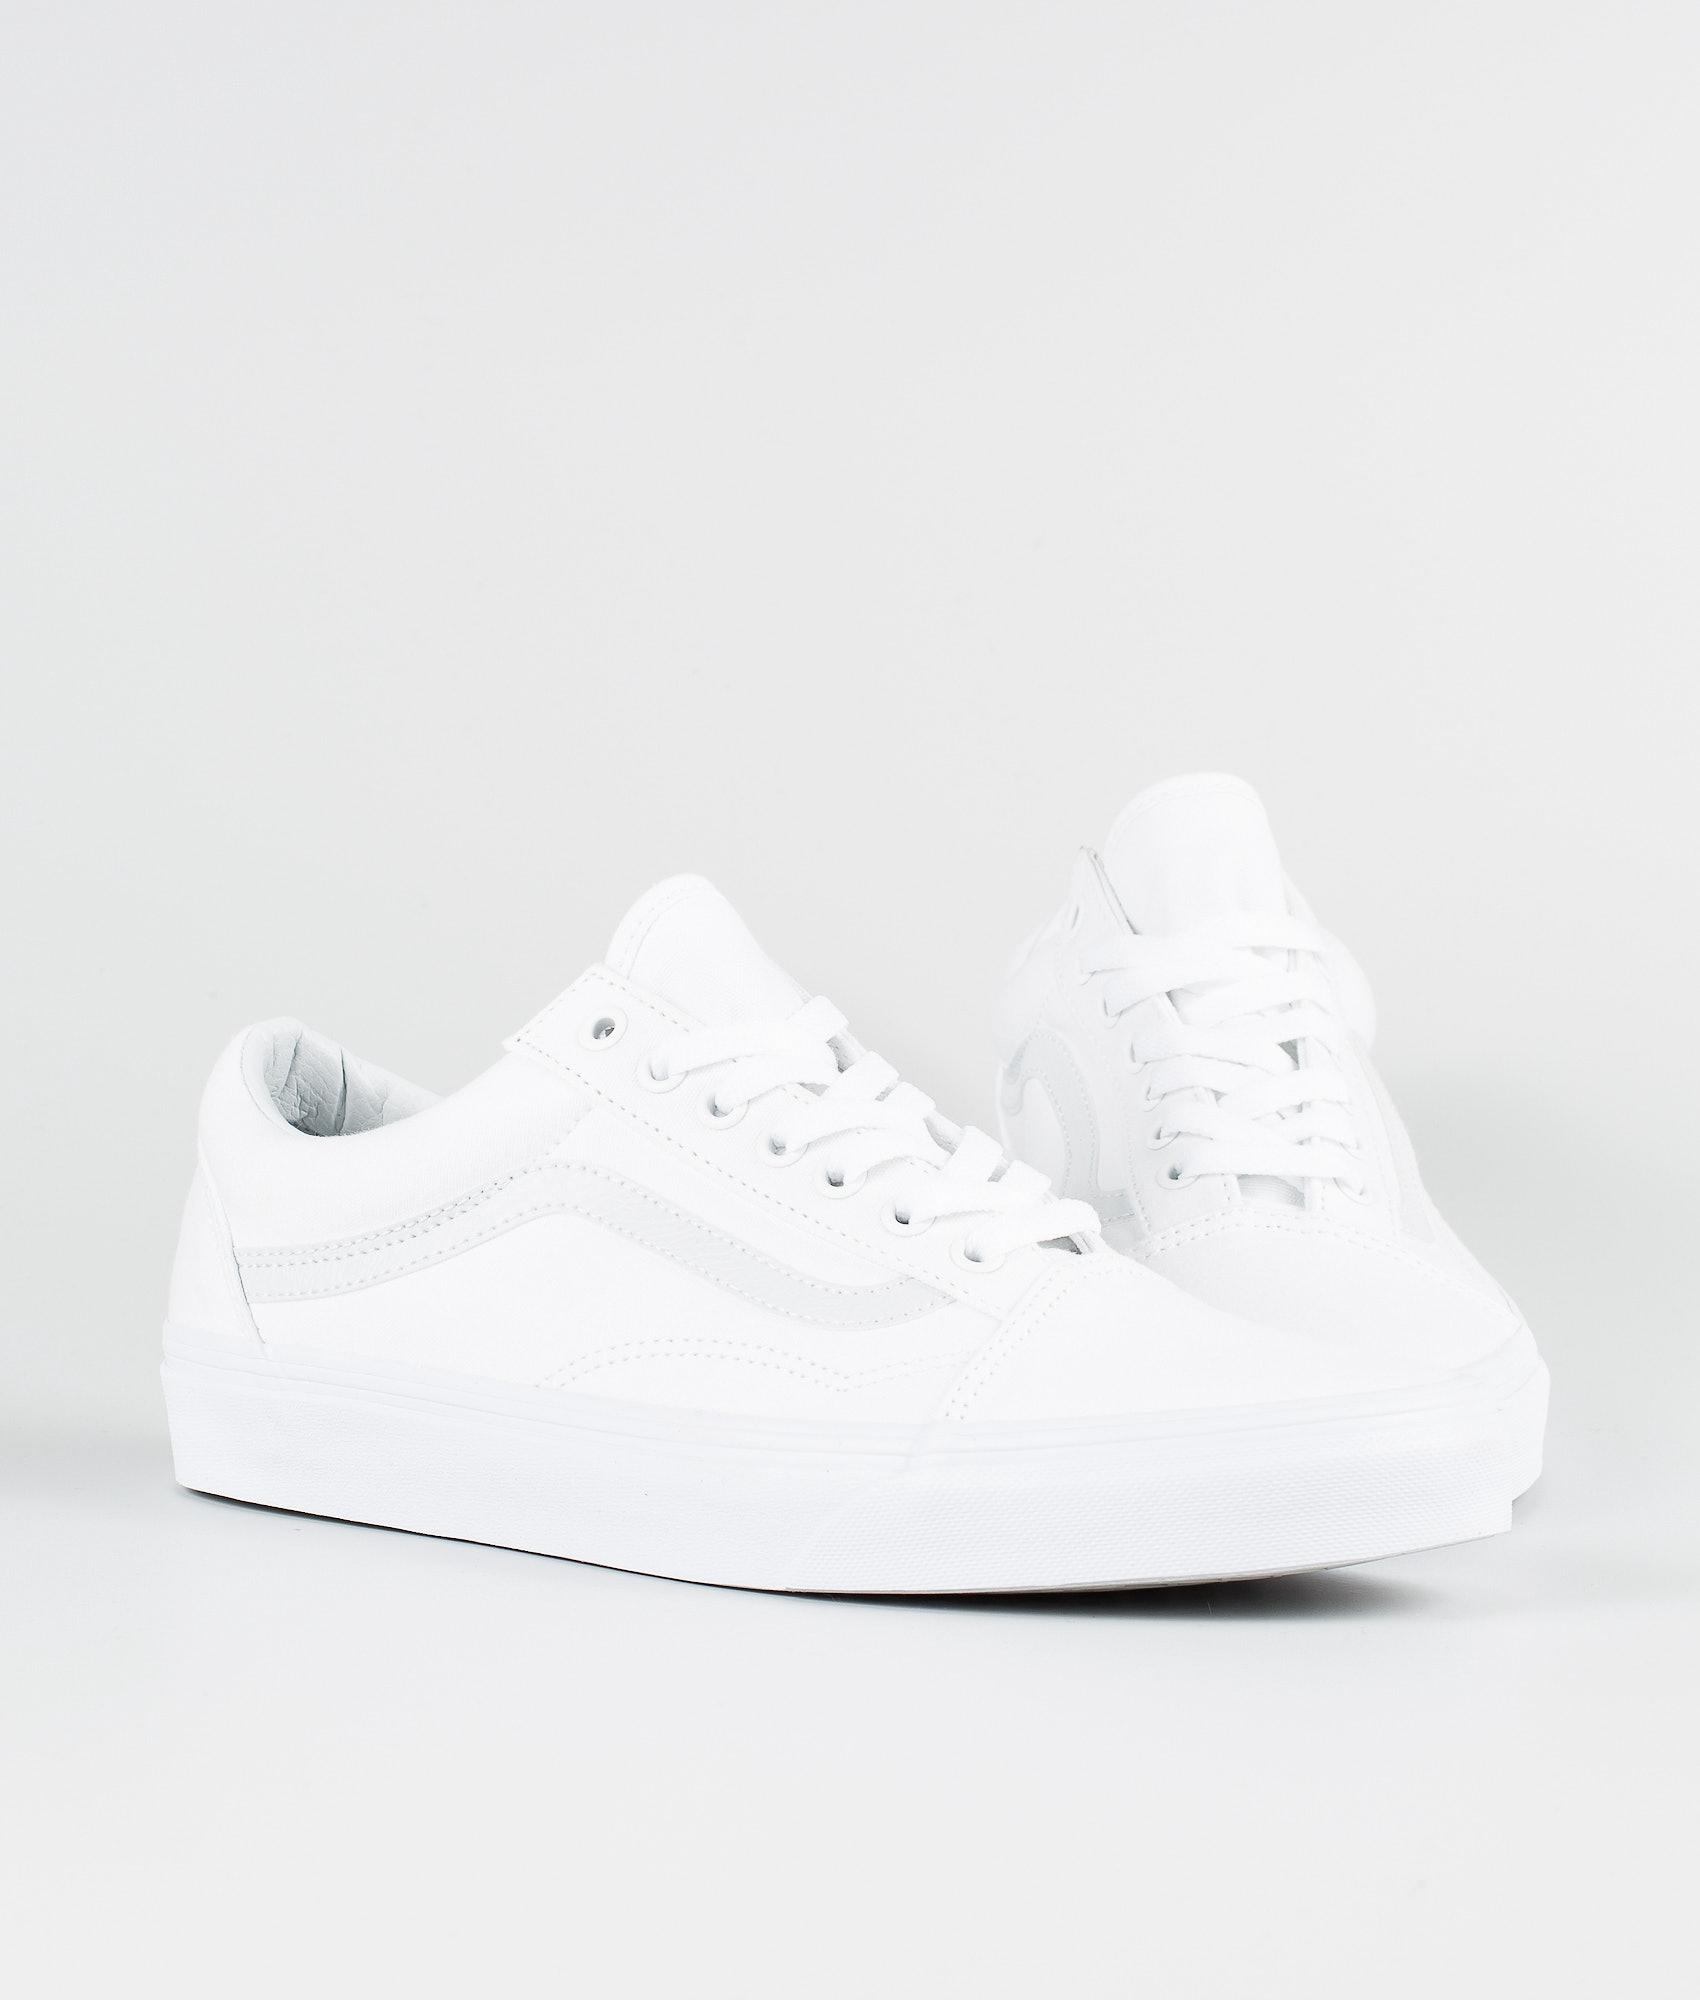 f36a94f0385c Vans Old Skool Shoes True White - Ridestore.com